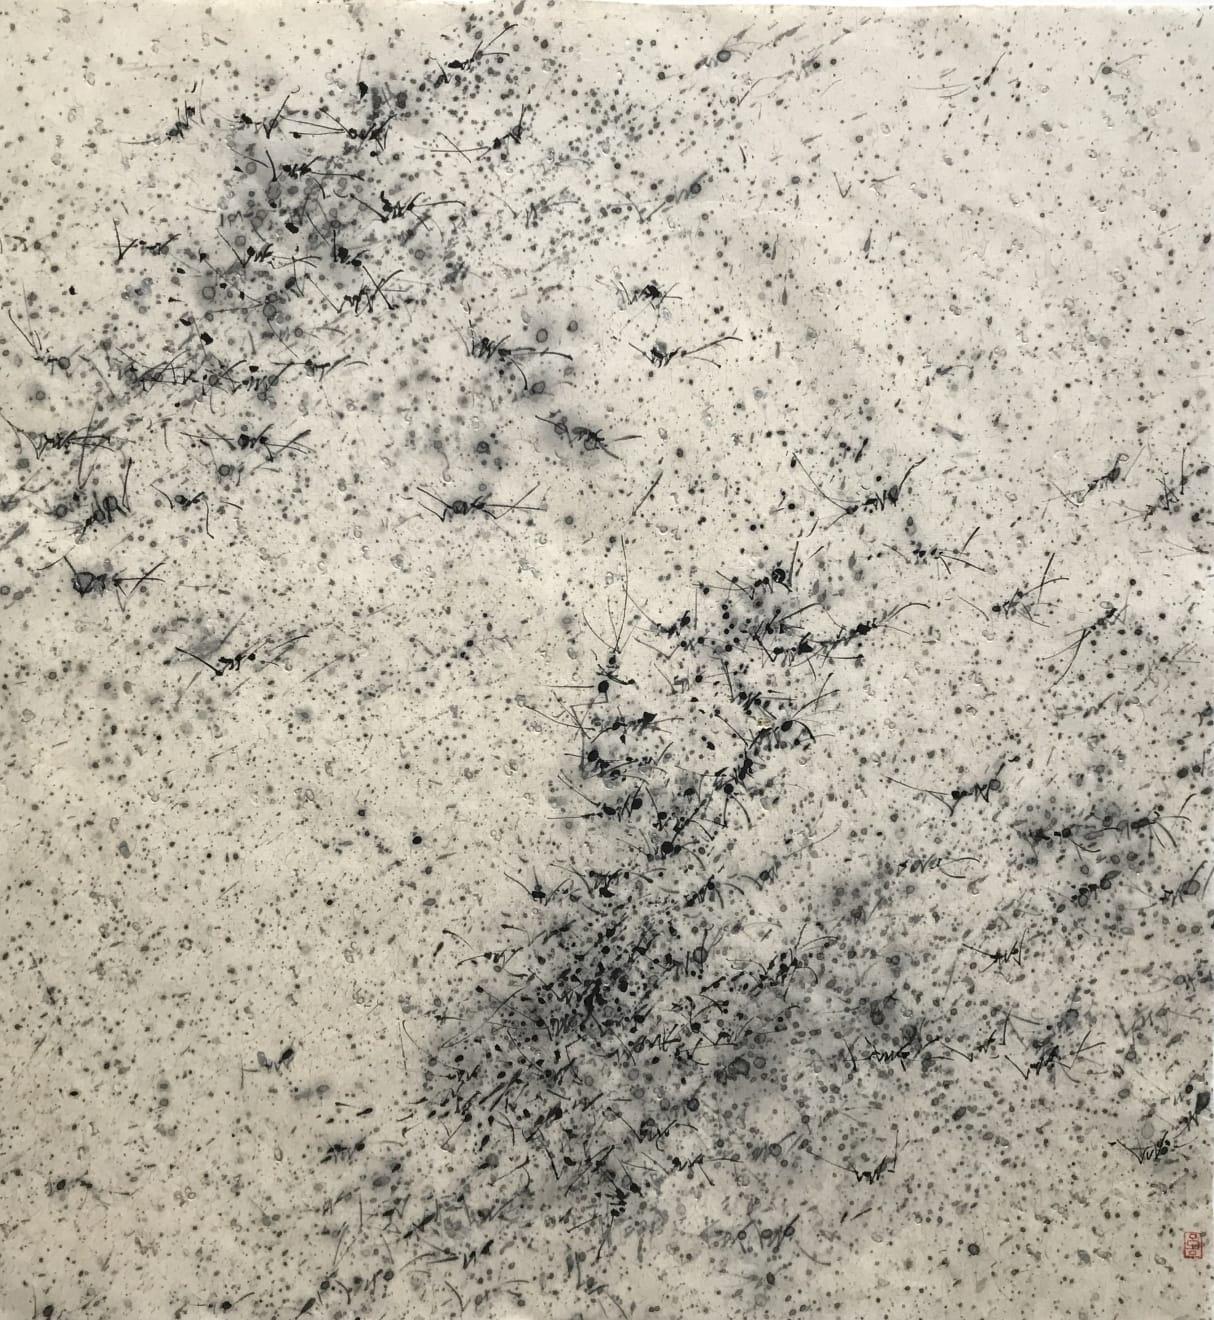 Zhang Yanzi 章燕紫, Limitless π 無盡π, 2017